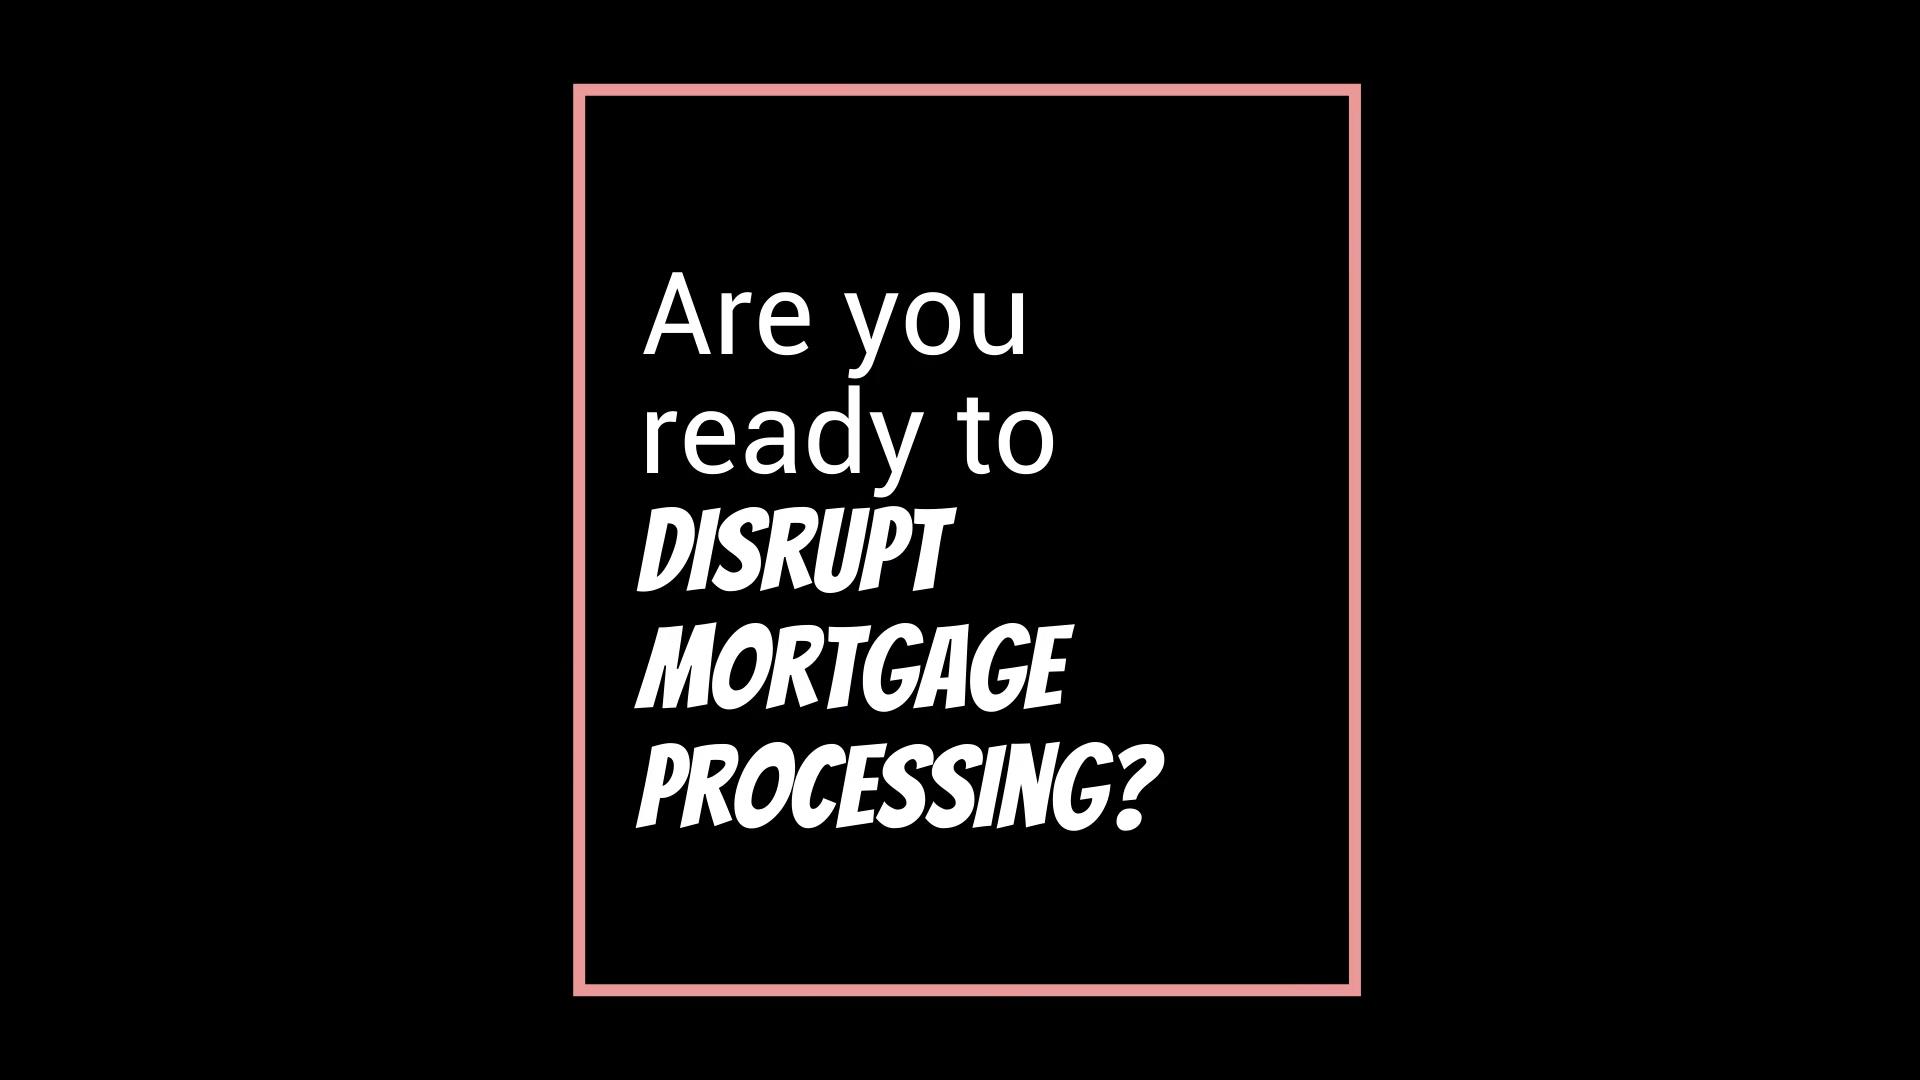 Disrupt Mortgage Processing 2